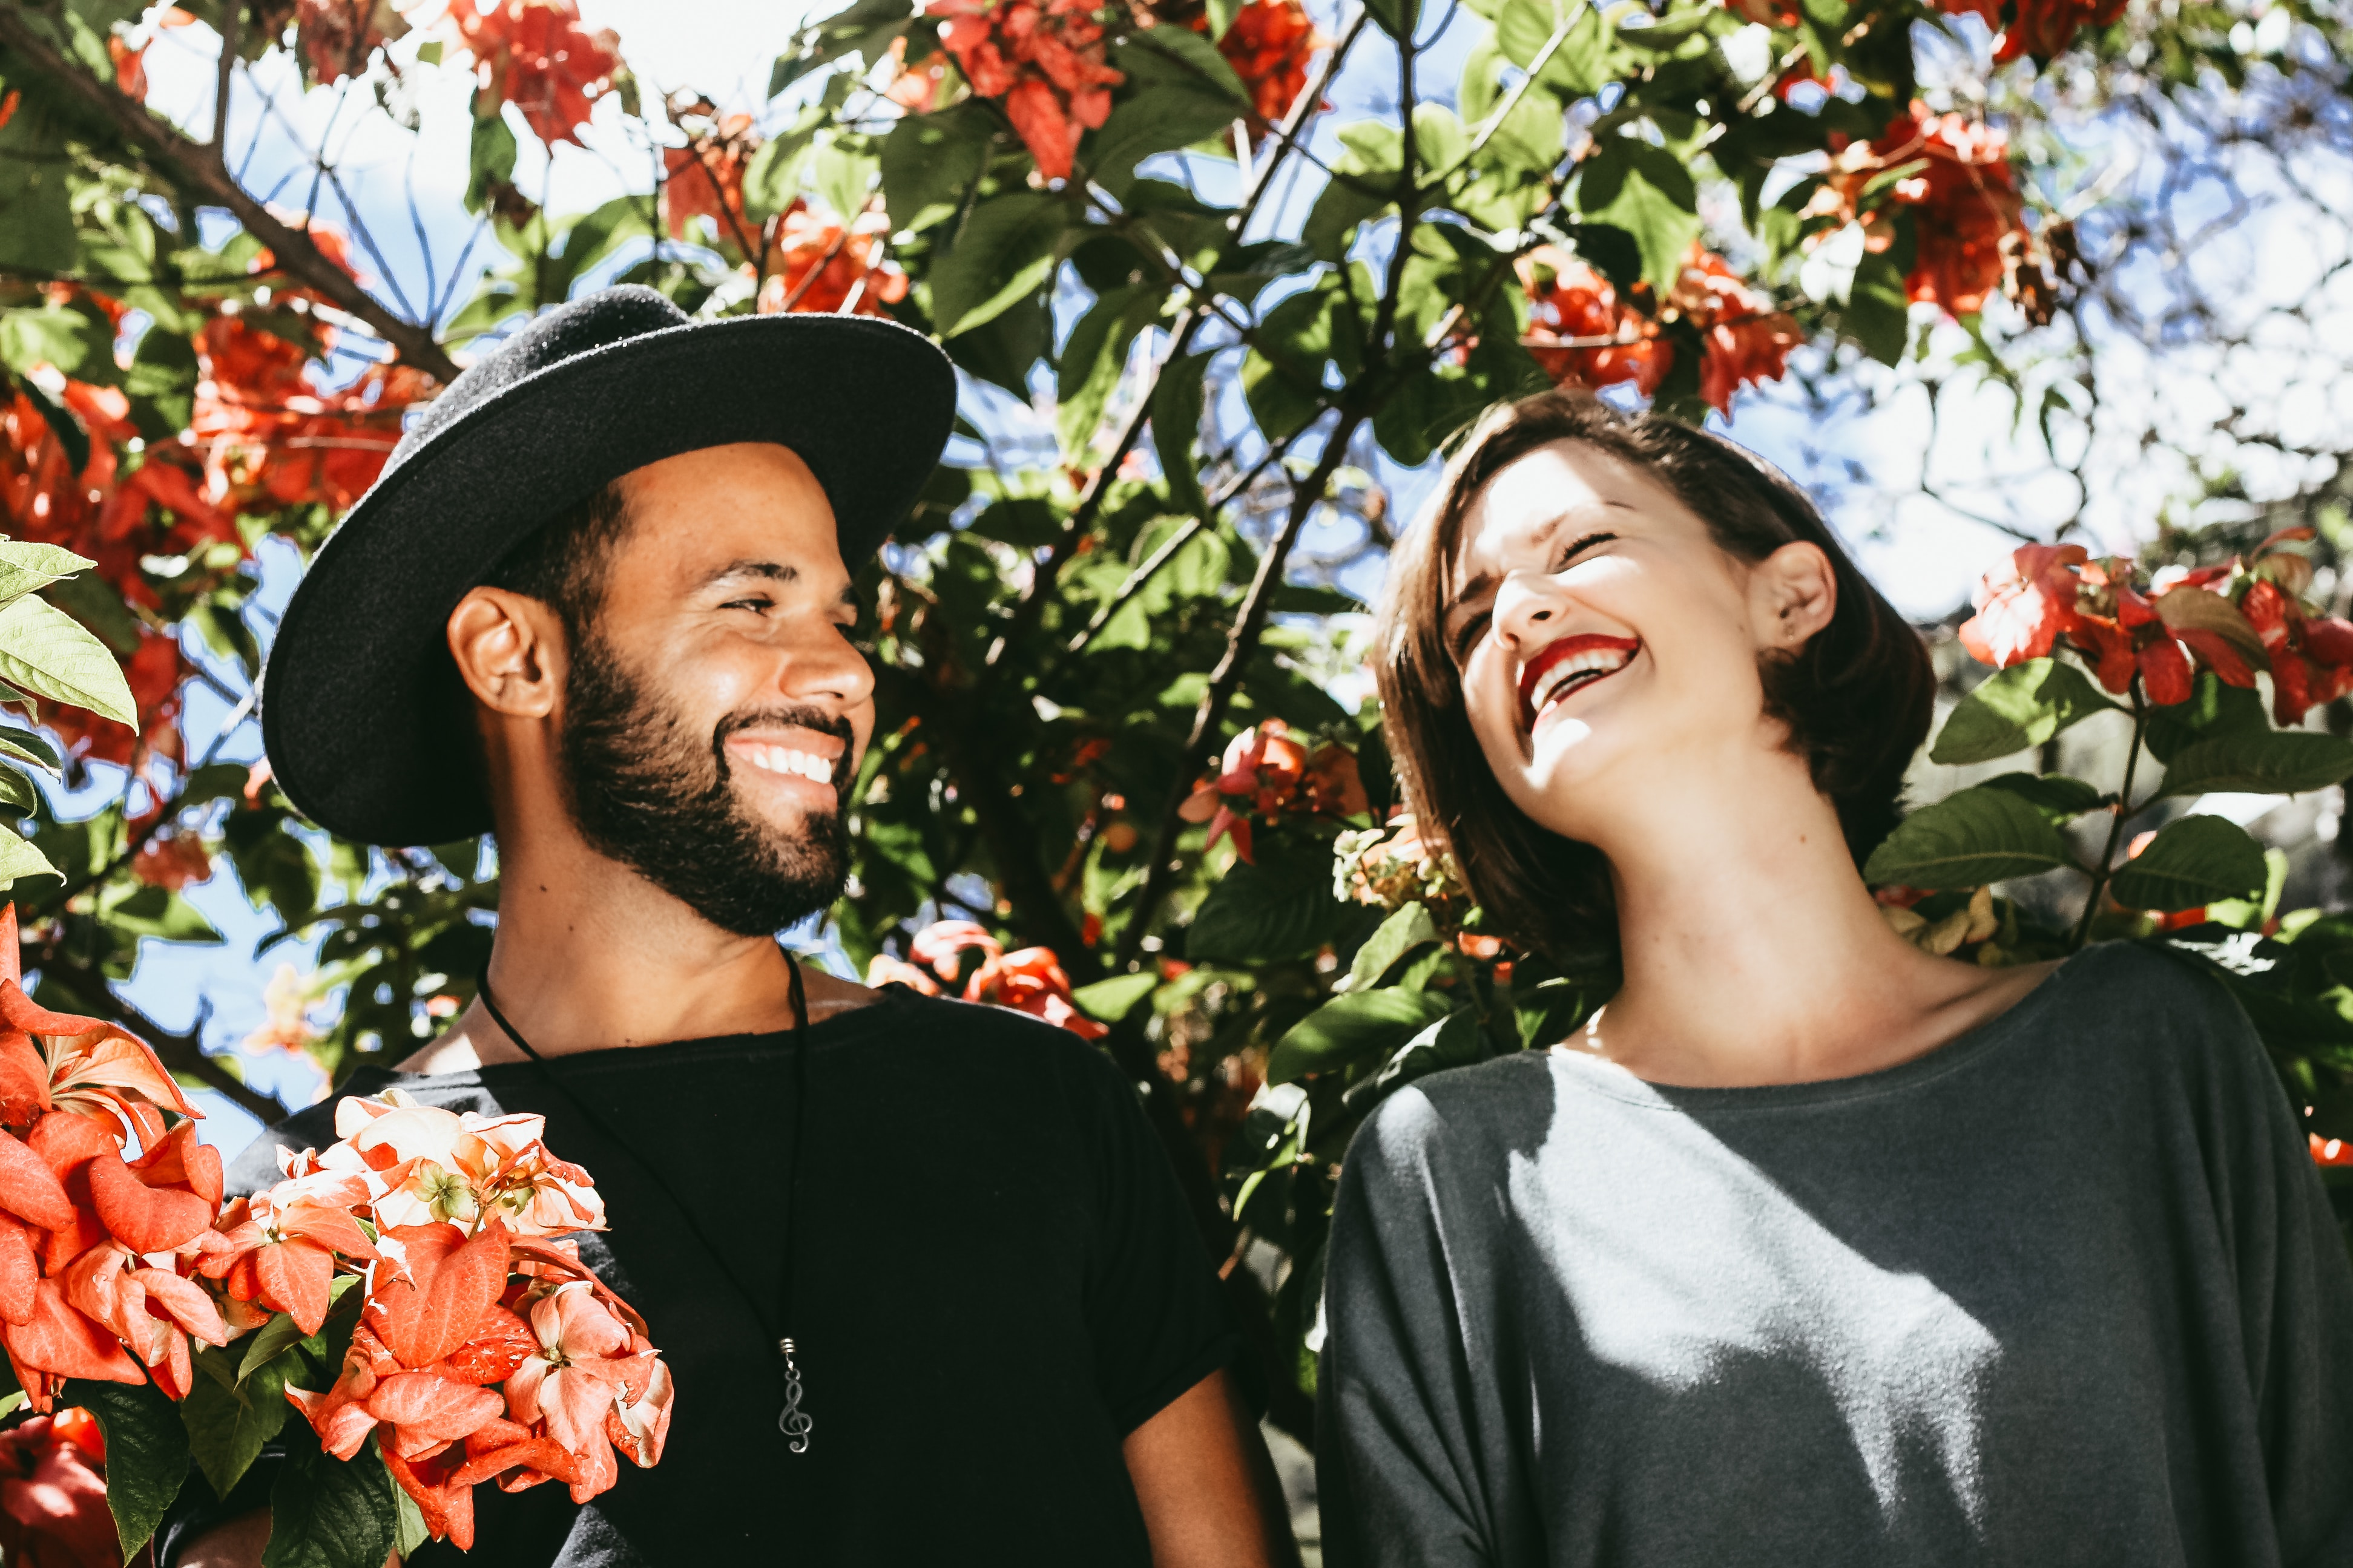 An interracial couple having a good date